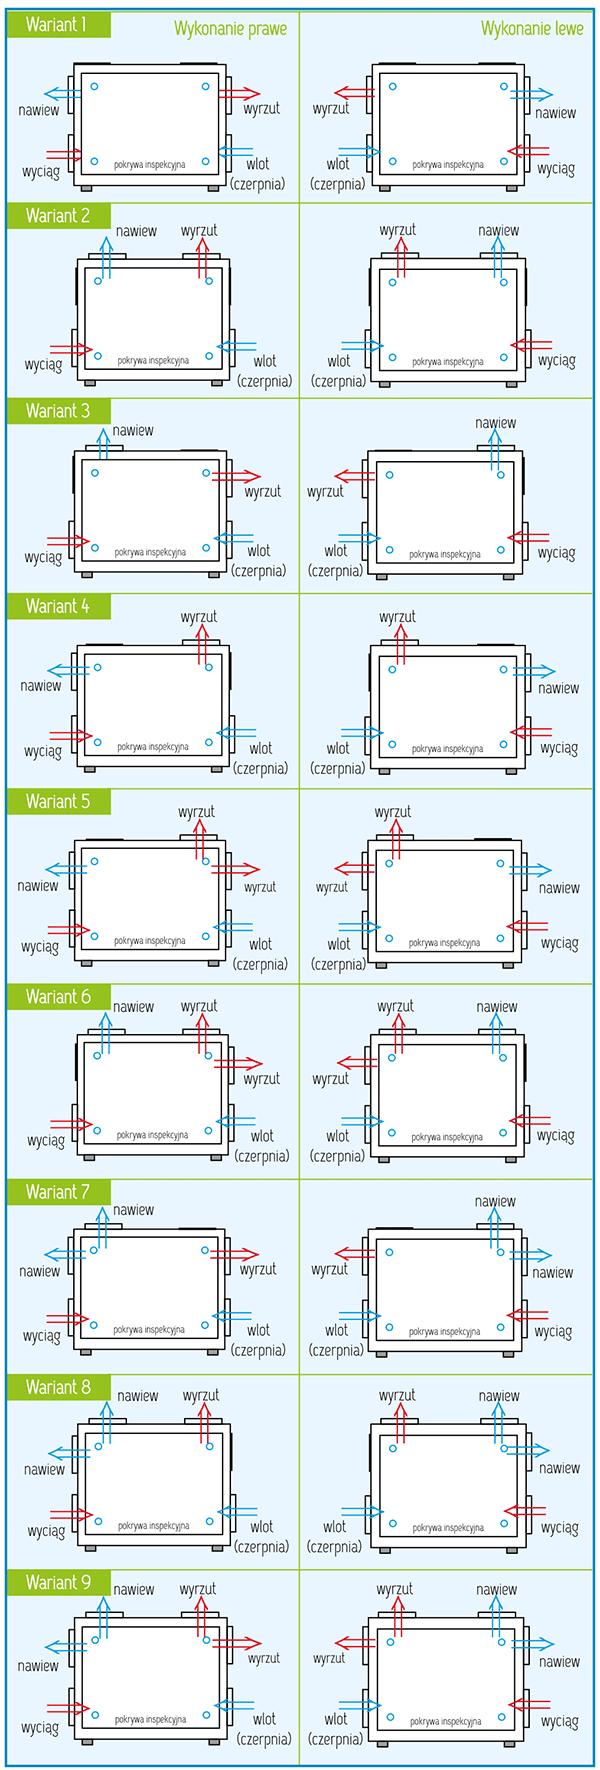 Warianty wykonania Rekuperator Pro-Vent Mistral Pro 850 EC